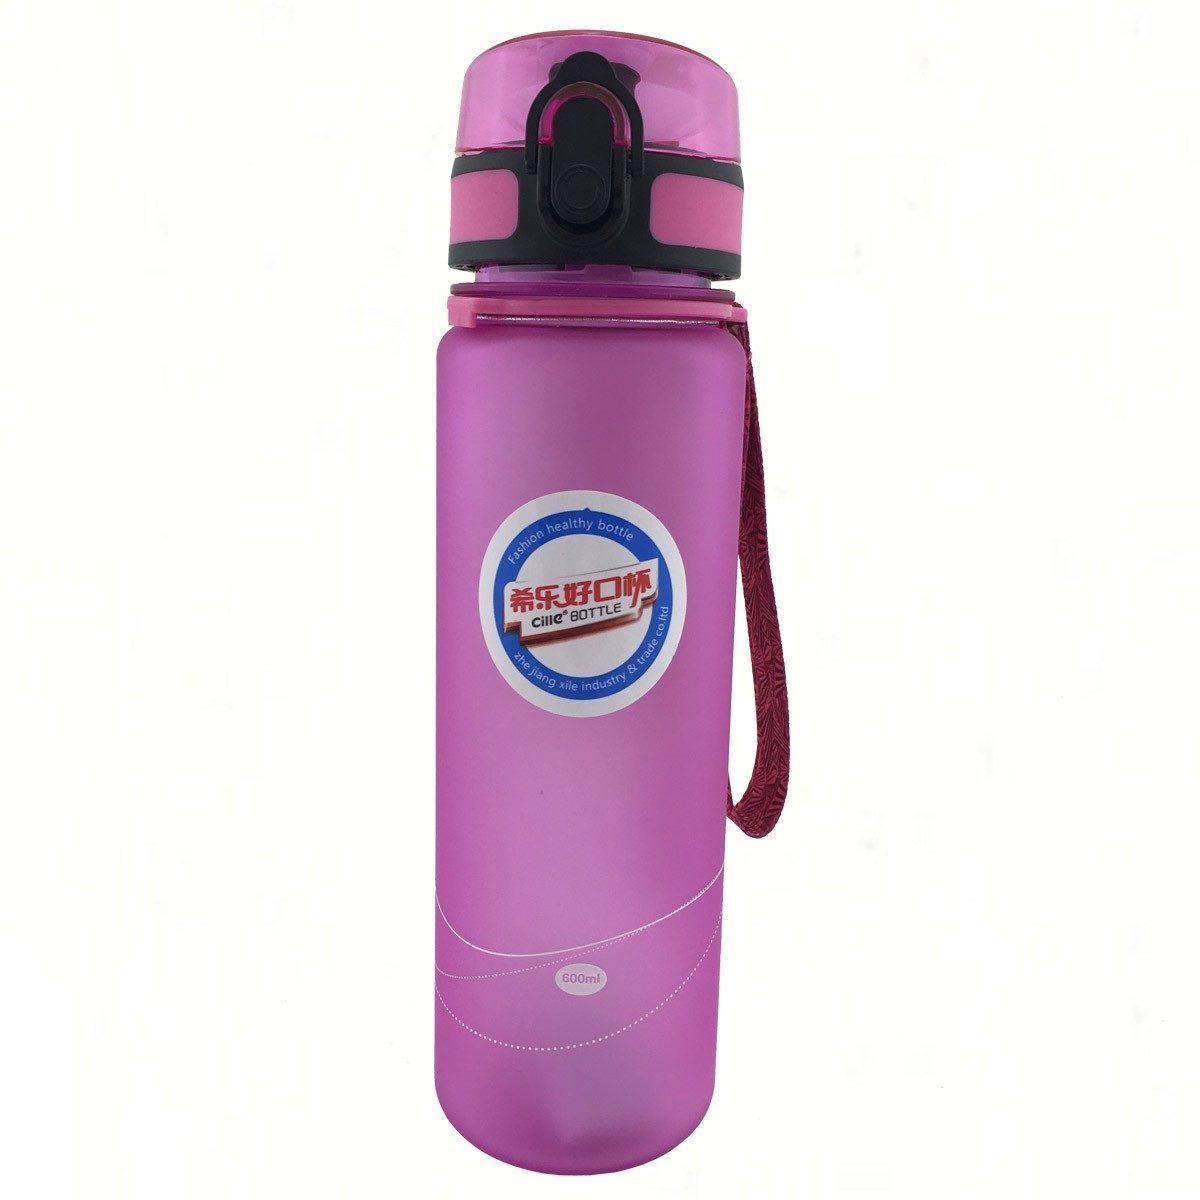 CILLE Бутылочка для воды 600 мл 1647: розовый - 1